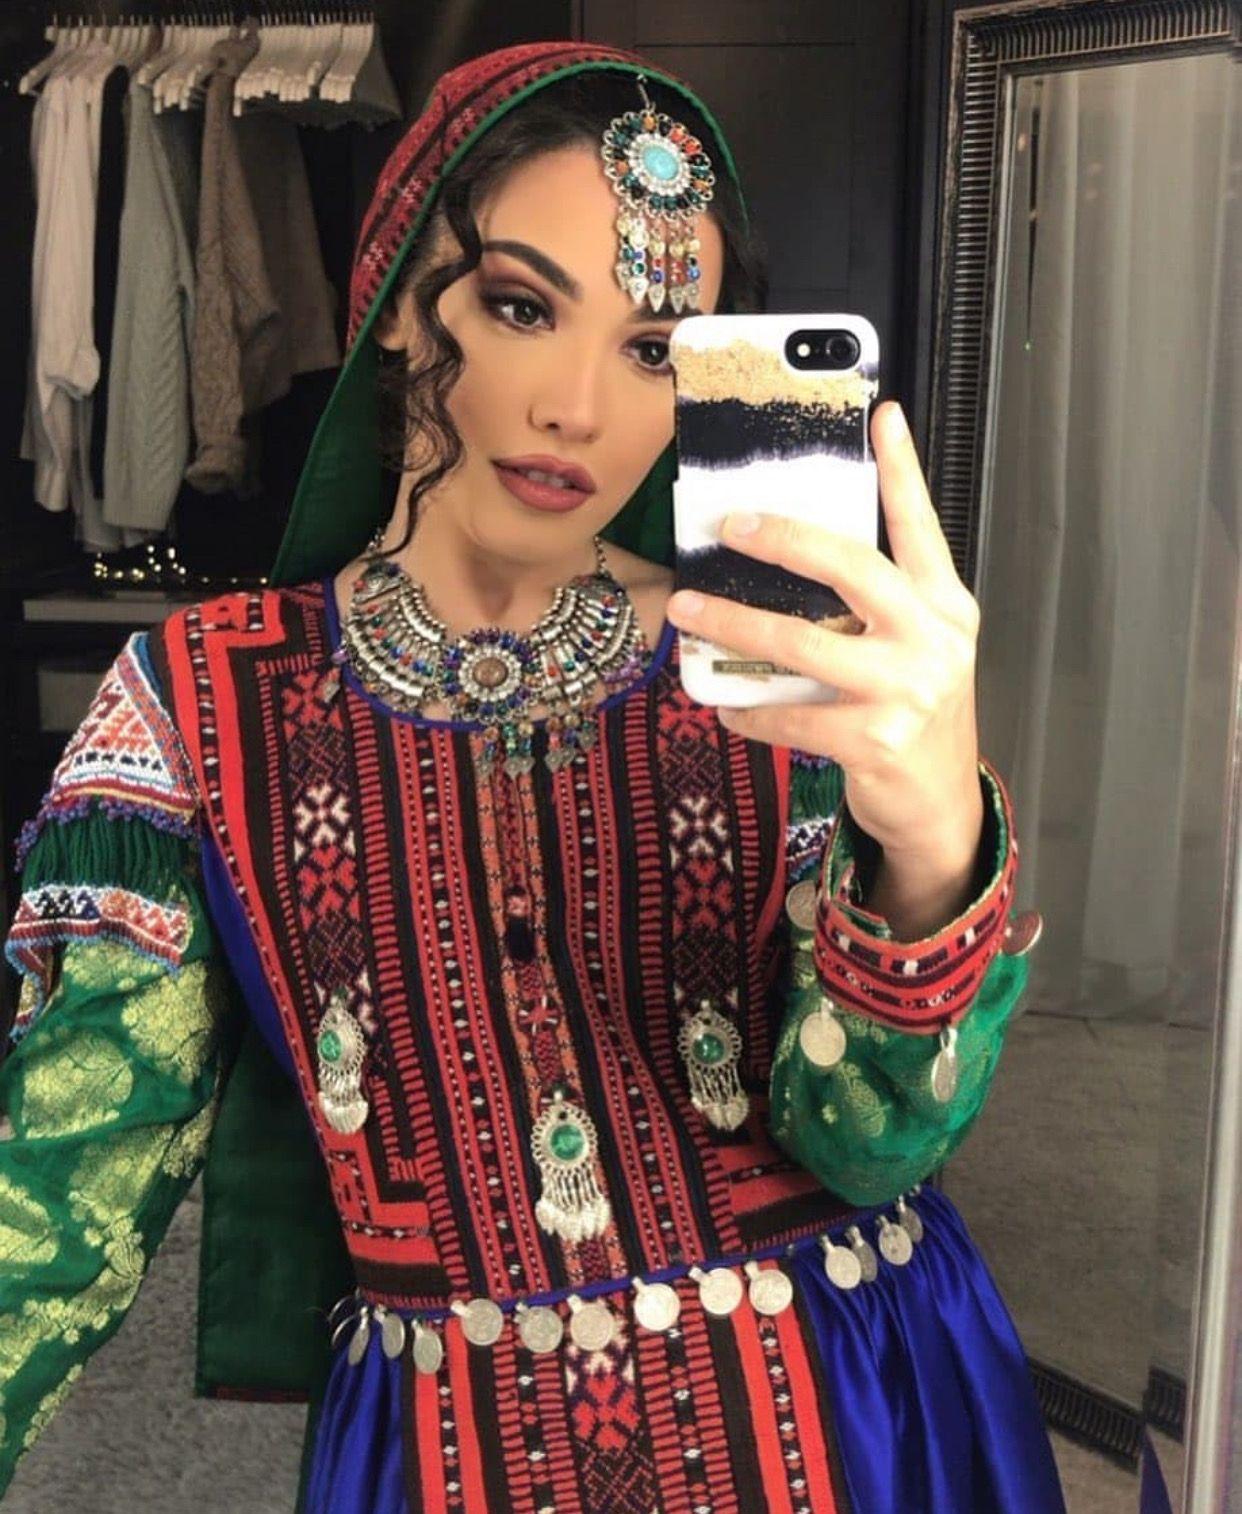 afghani #afghanistan #afghandress #afghanjewelry | afghan